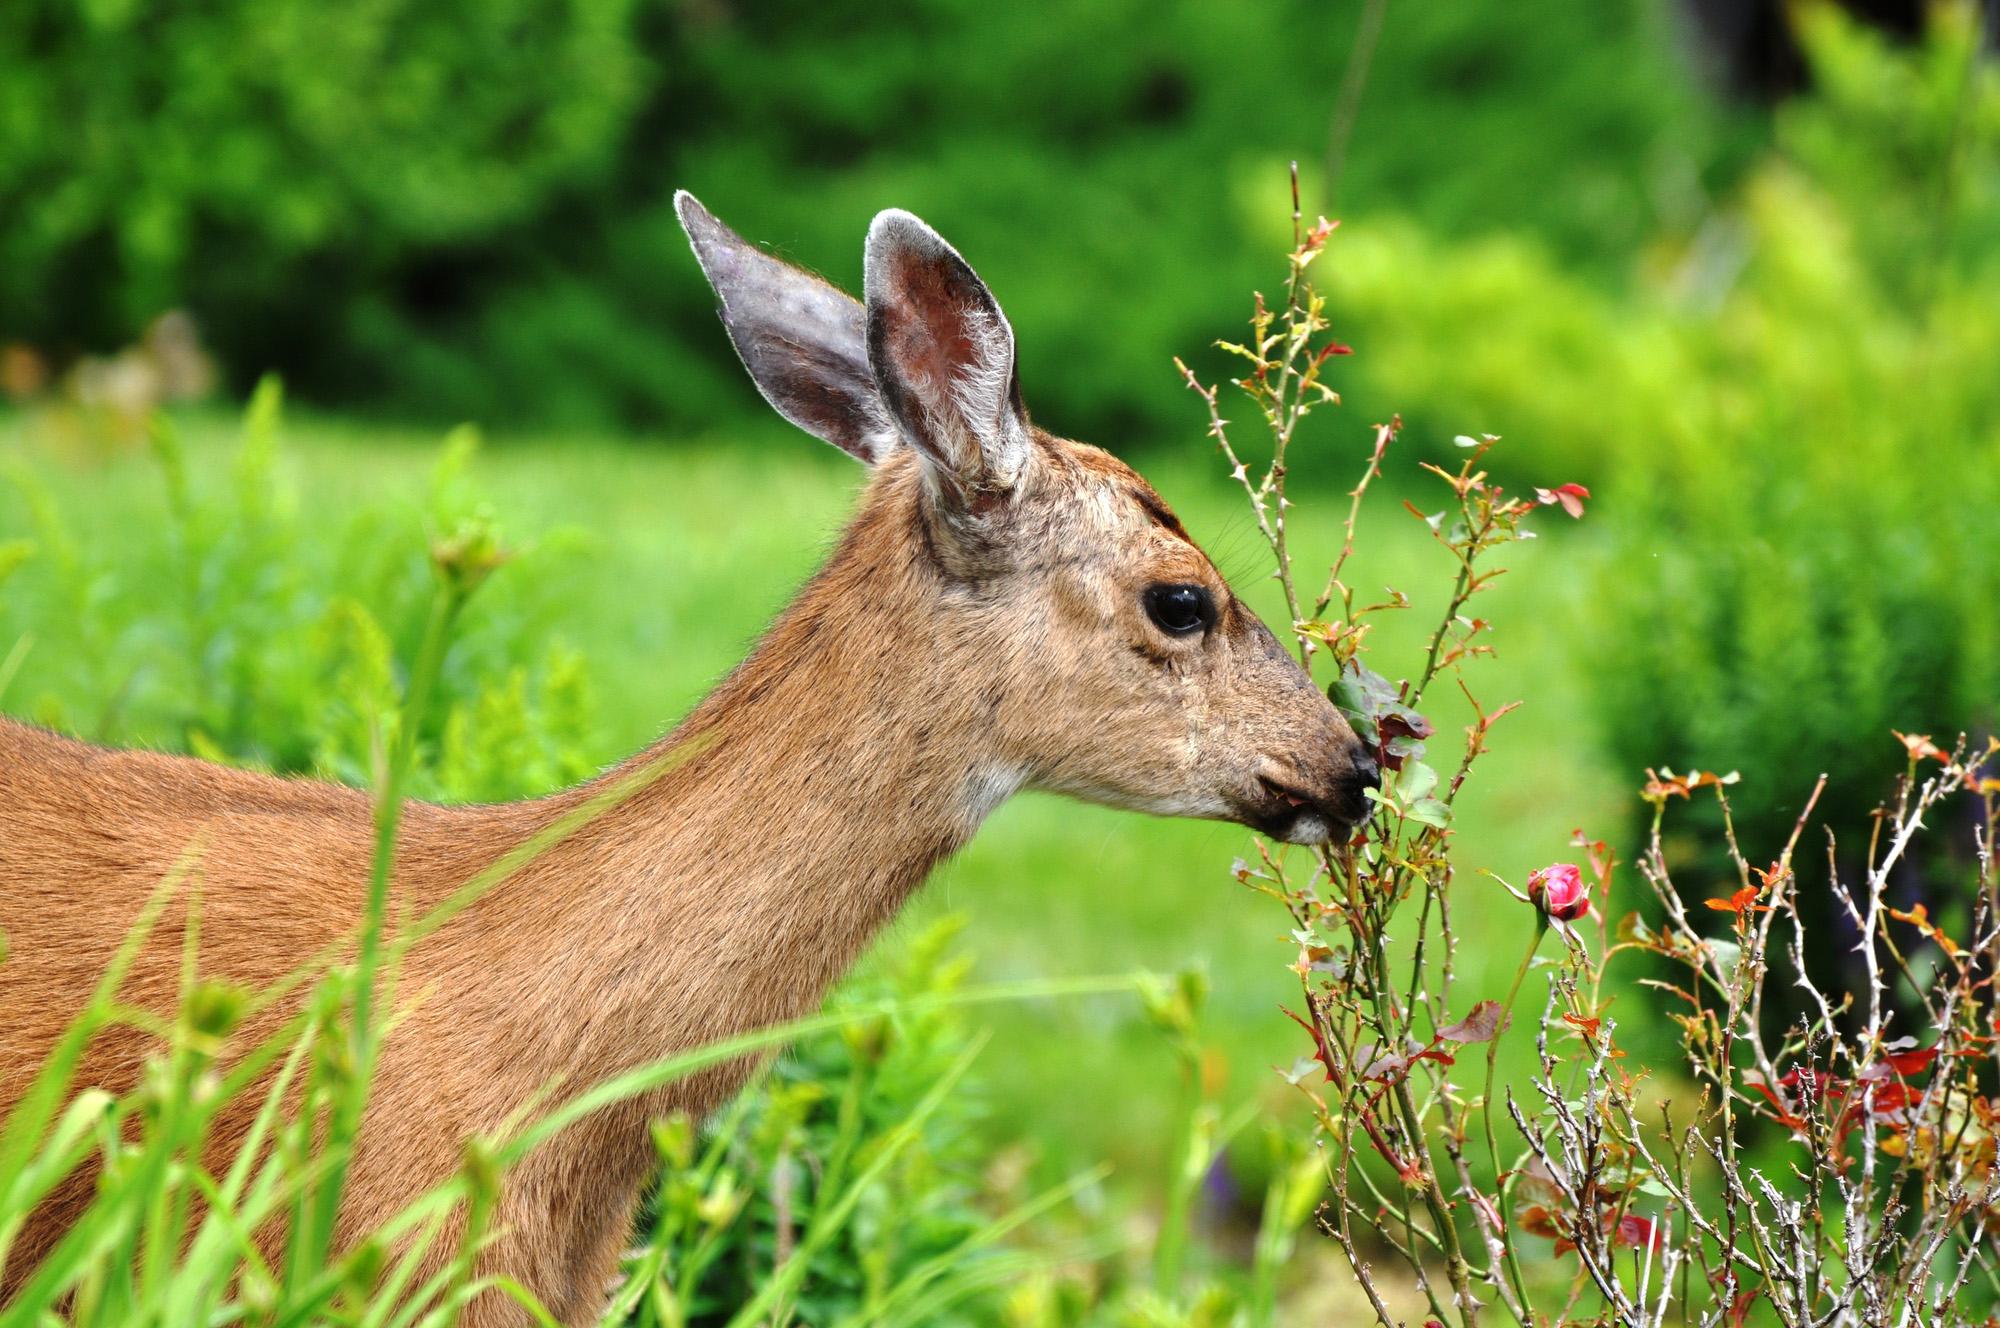 Corça comendo plantas no jardim